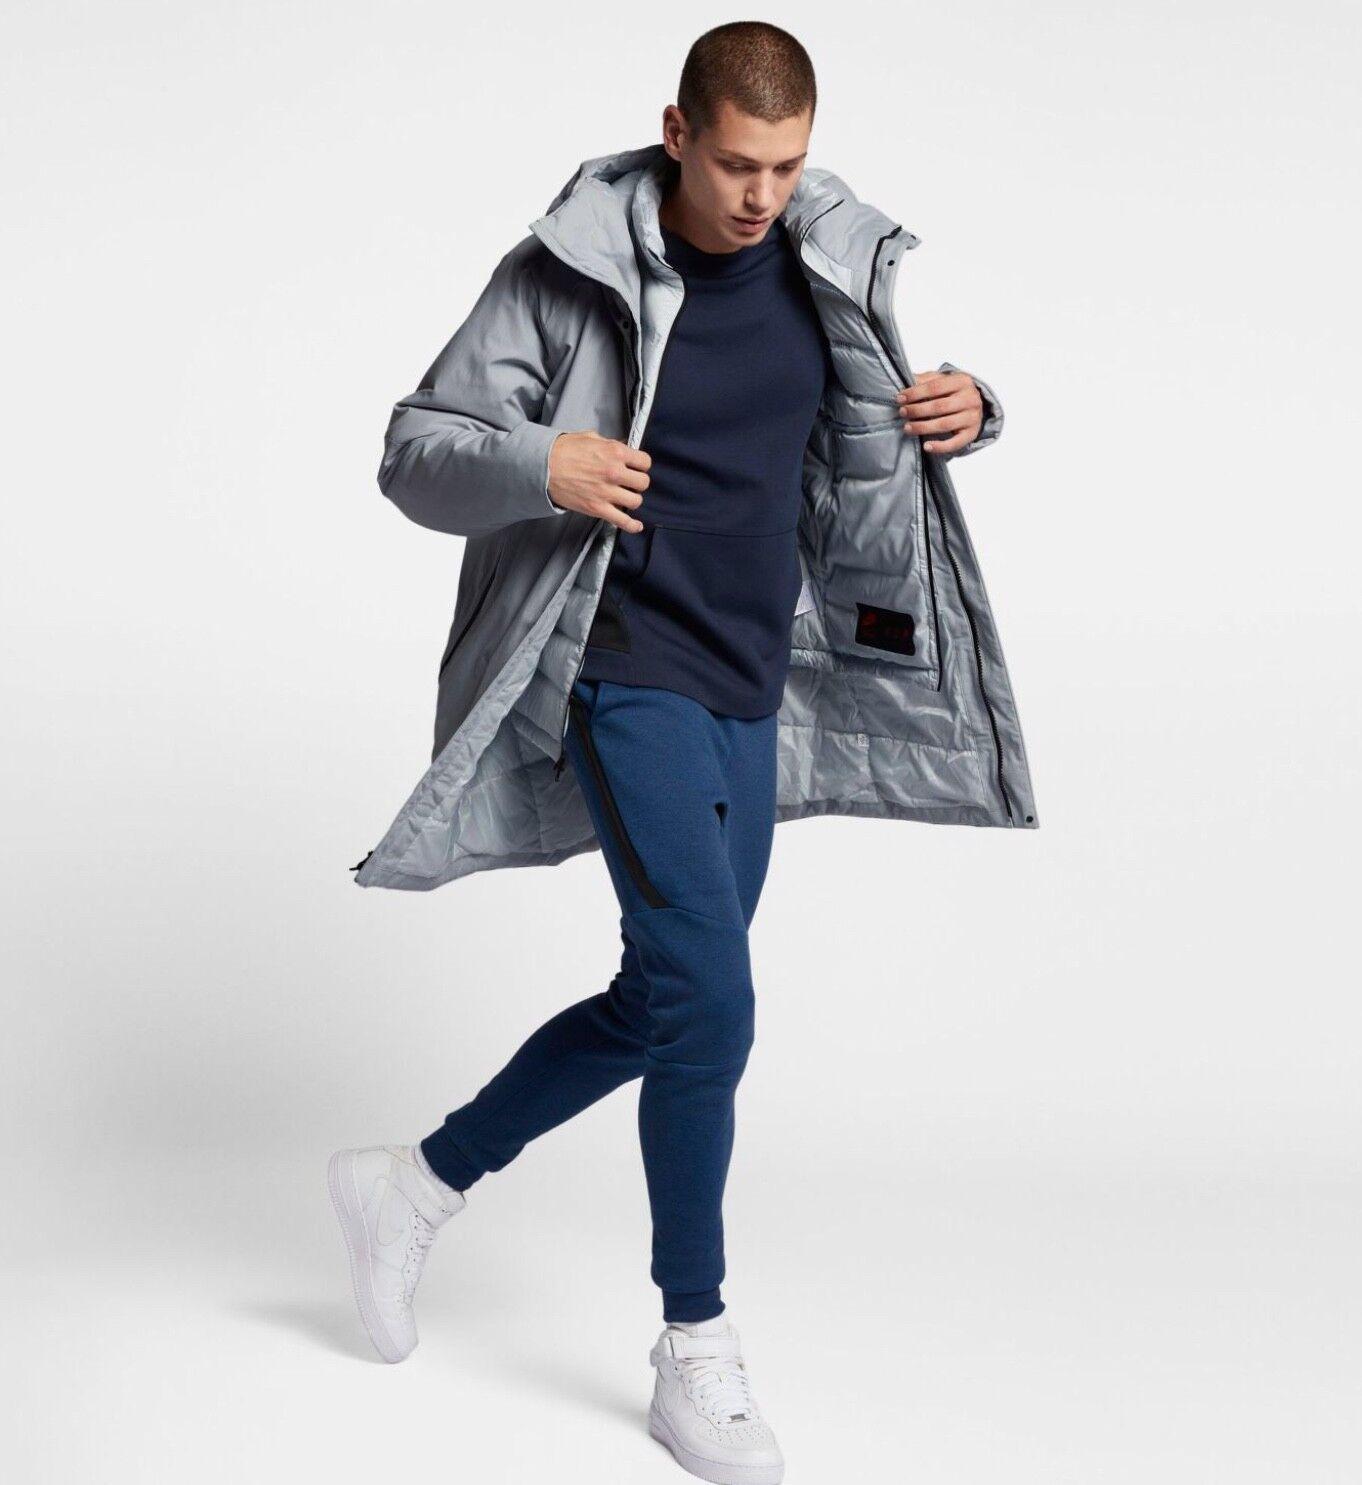 Nike Sportkleidung Tech Aeroloft 3-IN-1 Herren Jacke 863730-012 863730-012 863730-012 Größe XL 32aab5